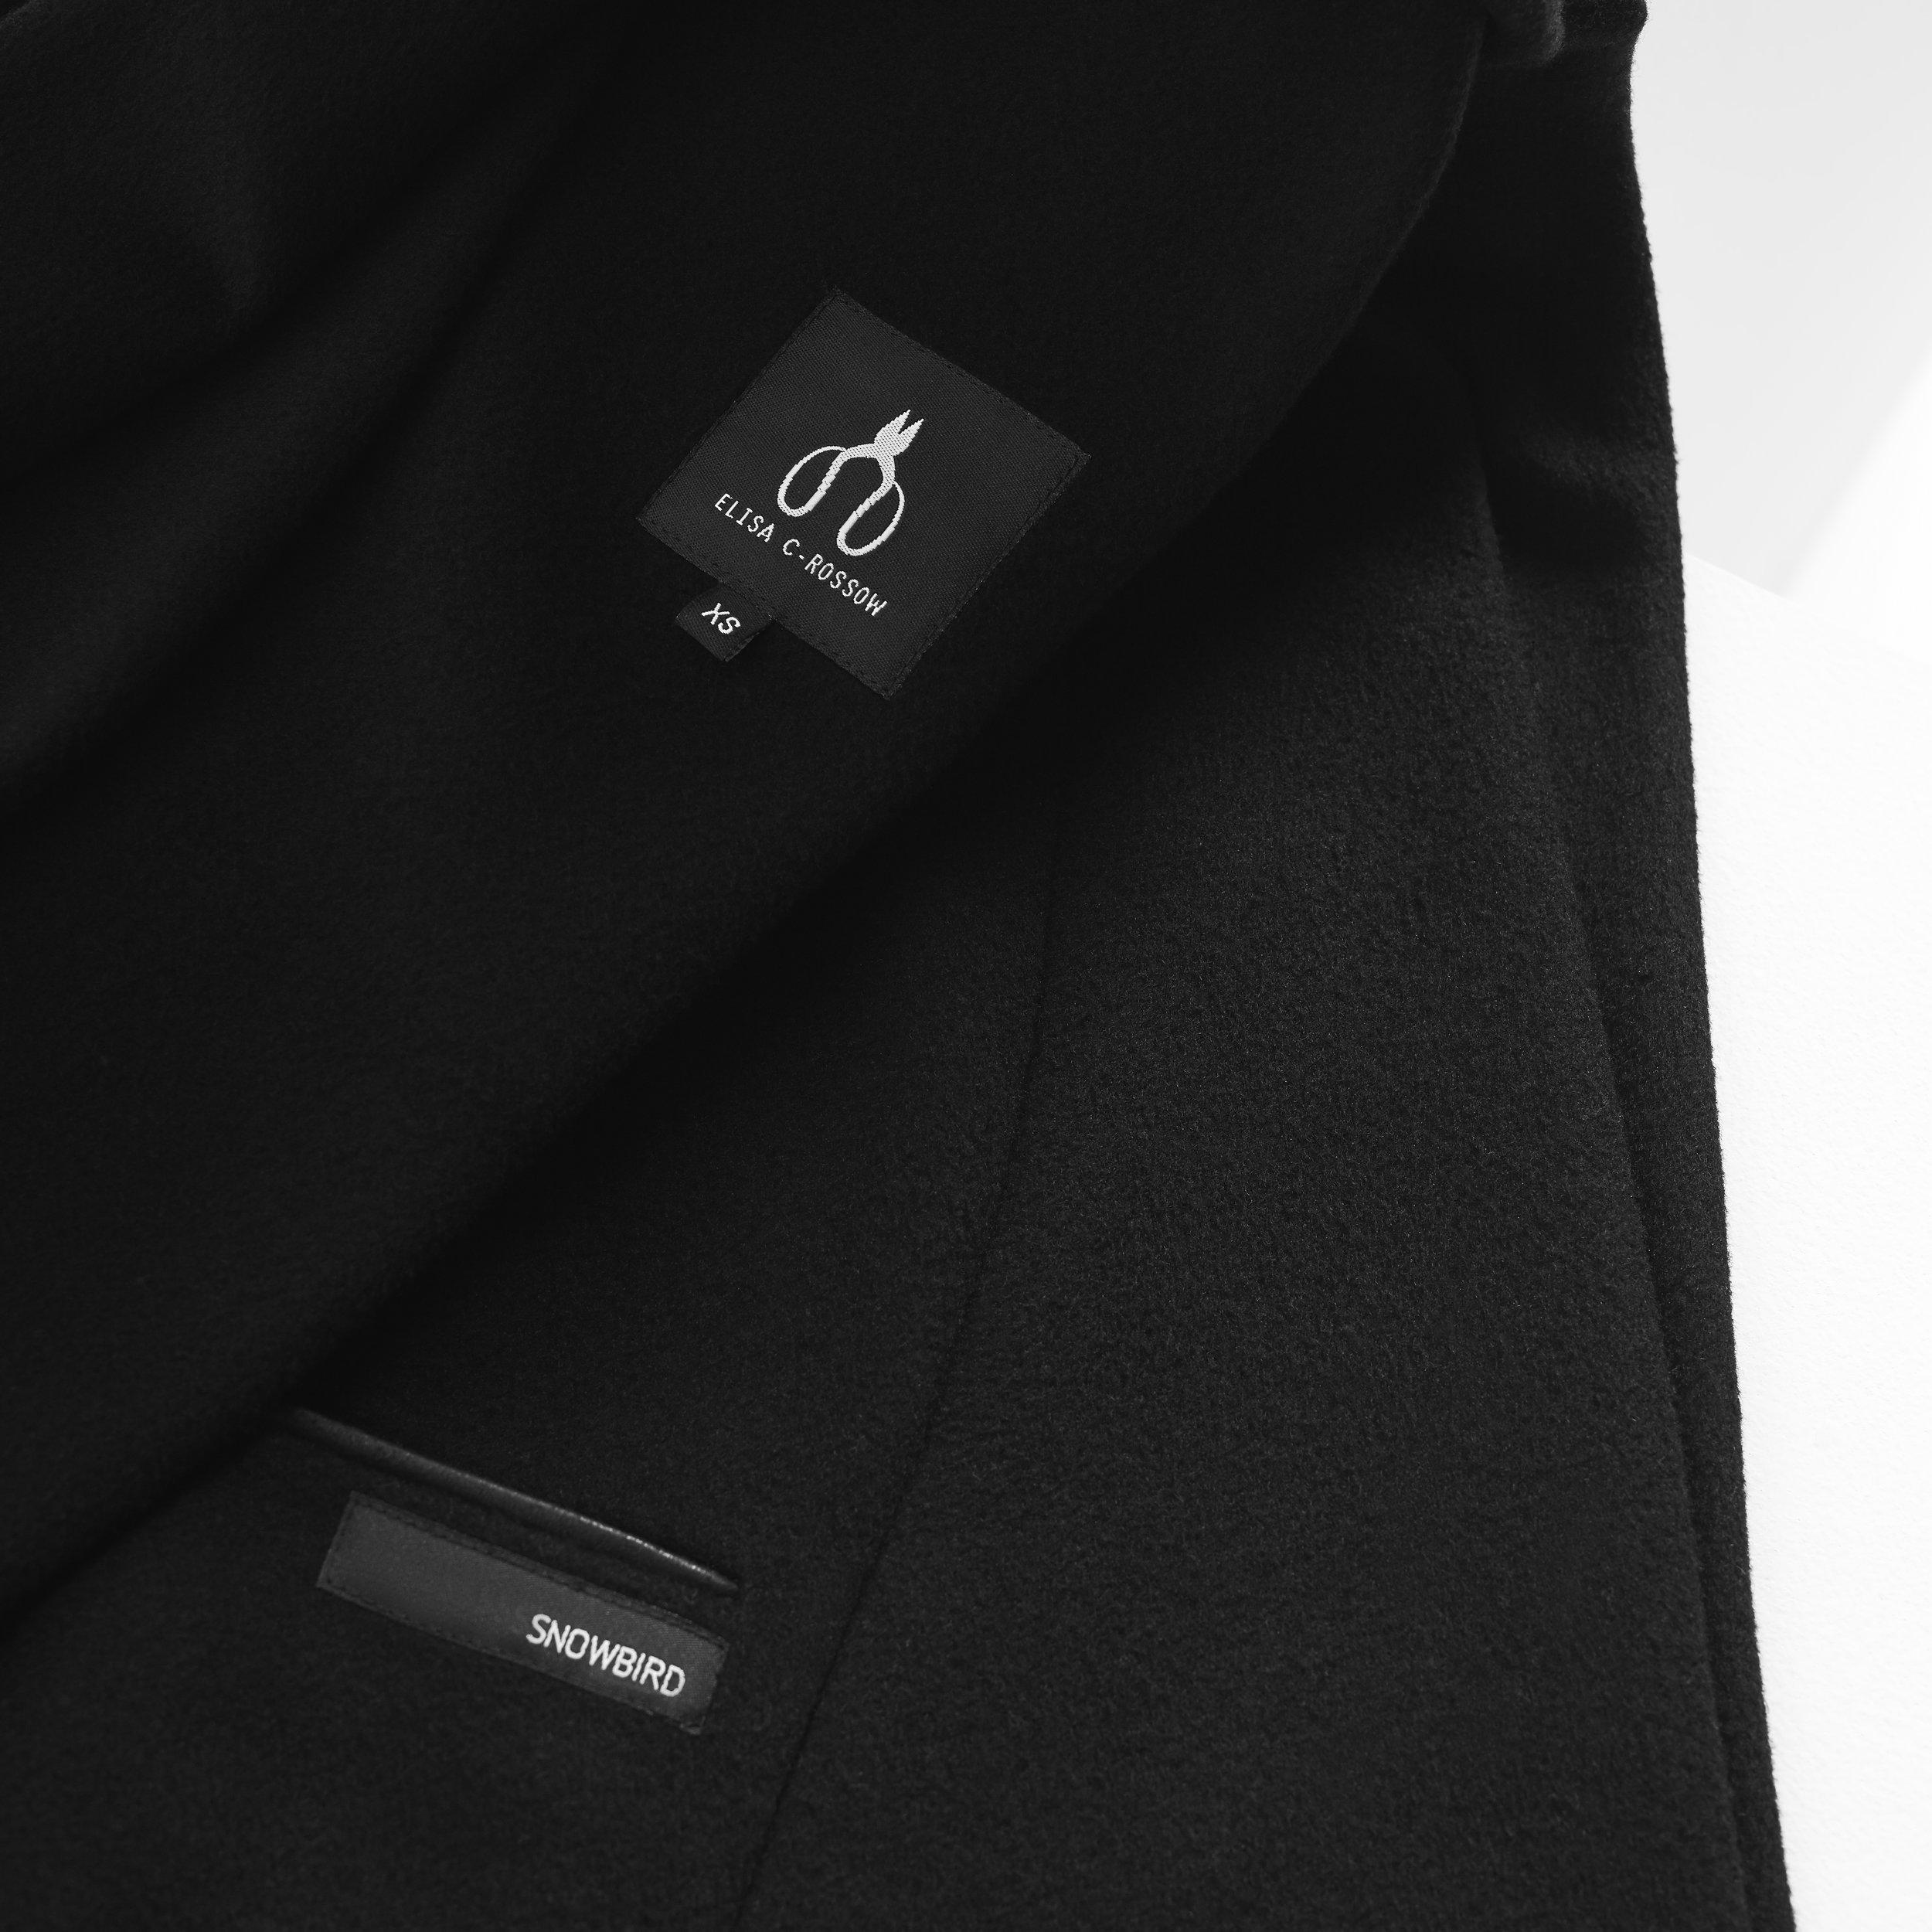 elisa-c-rossow/coat/detail/inside/pocket/snowbird